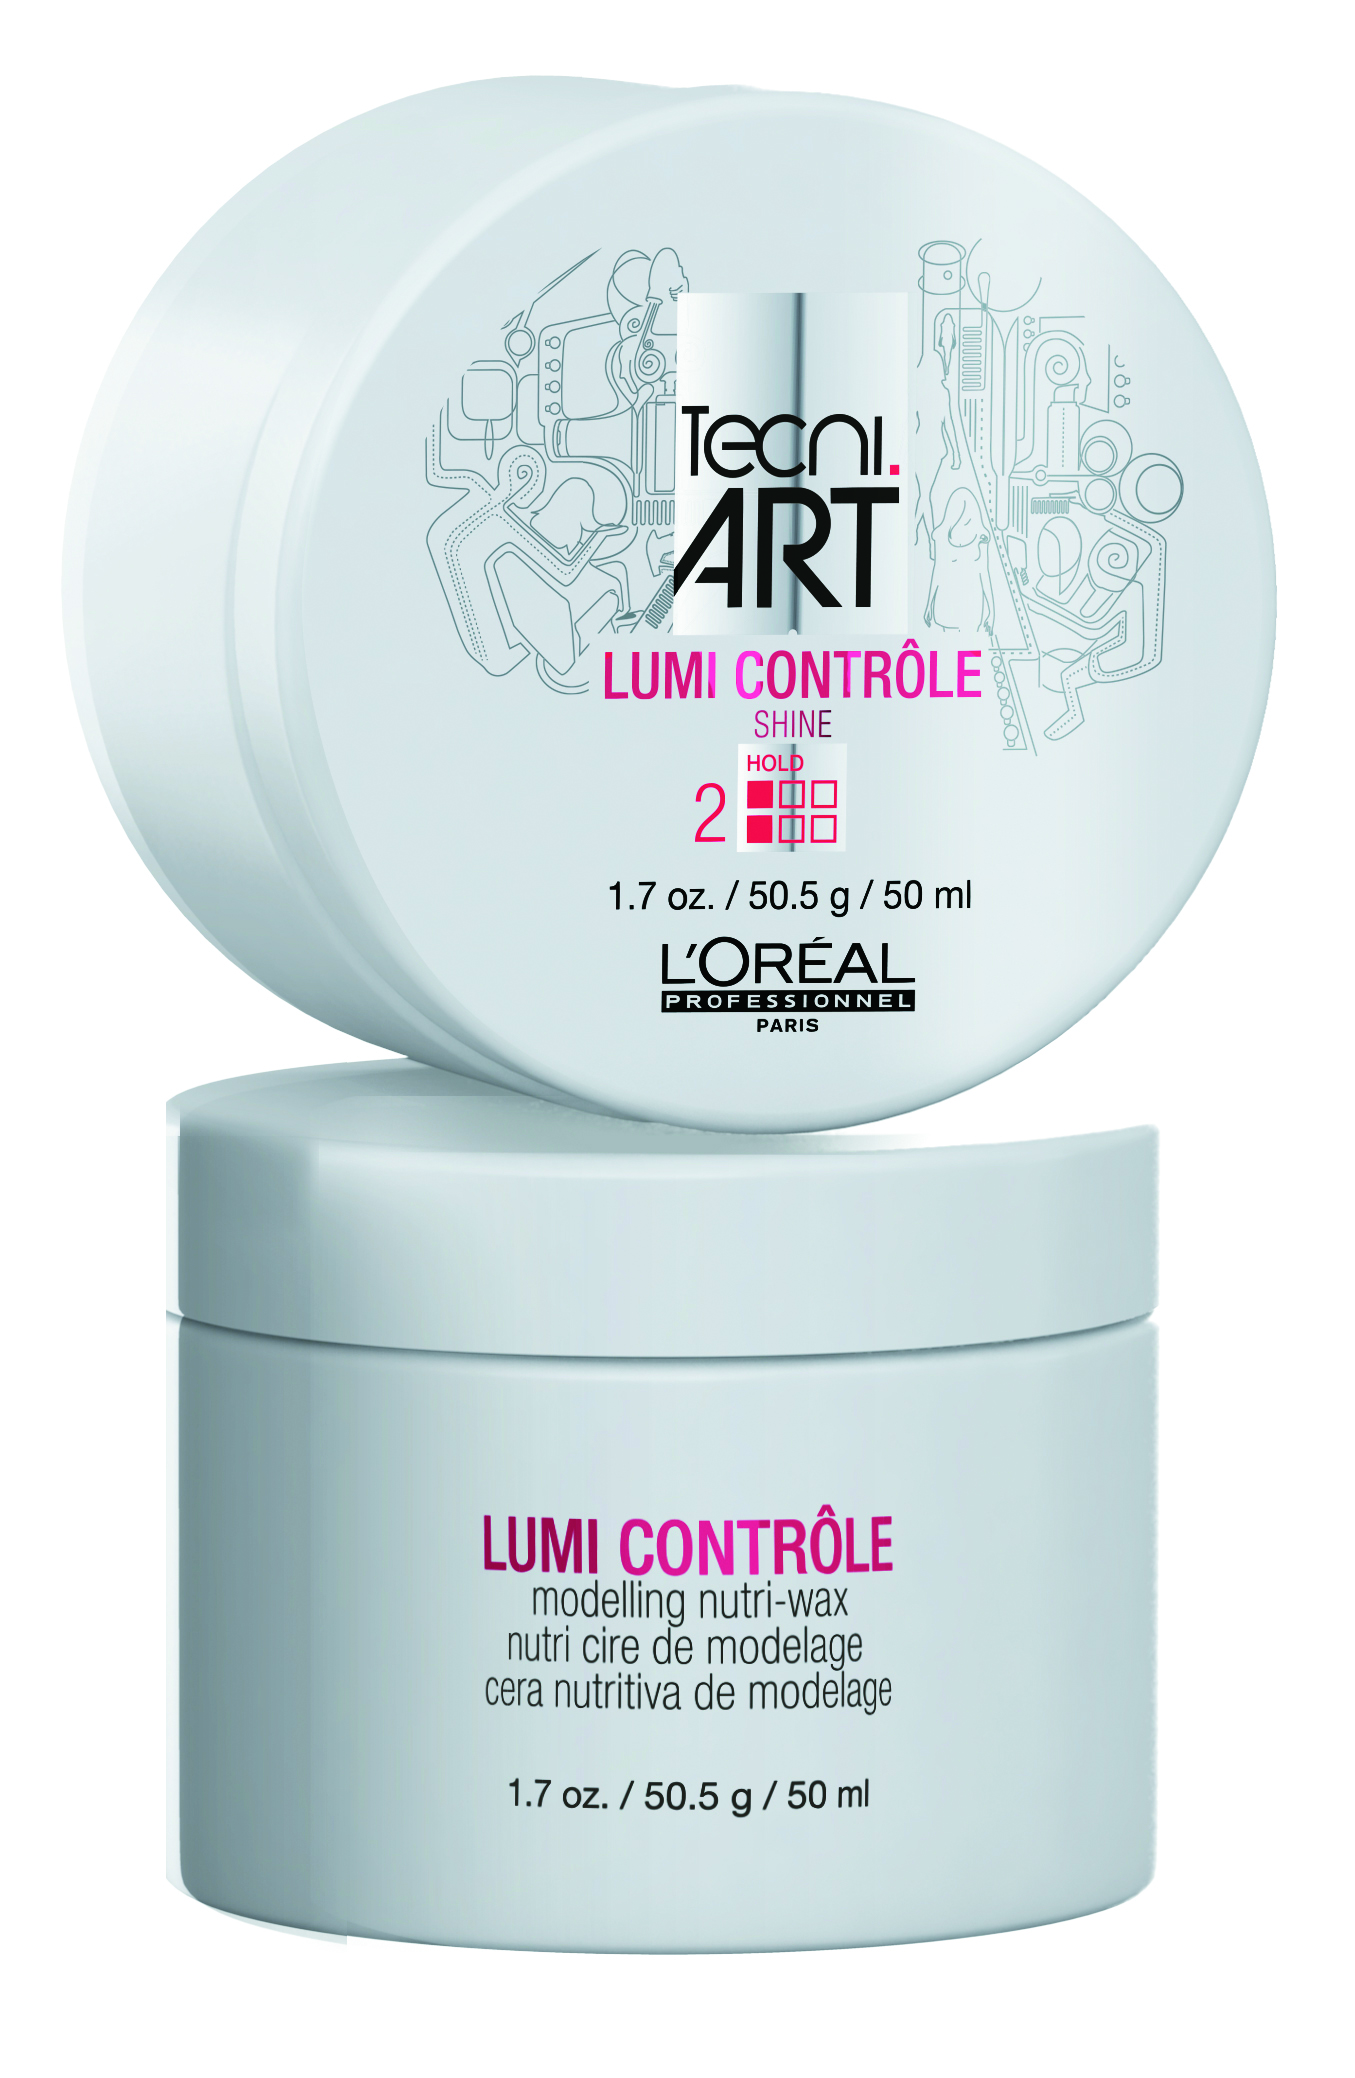 L'Oréal Techni.Art Lumi Controle